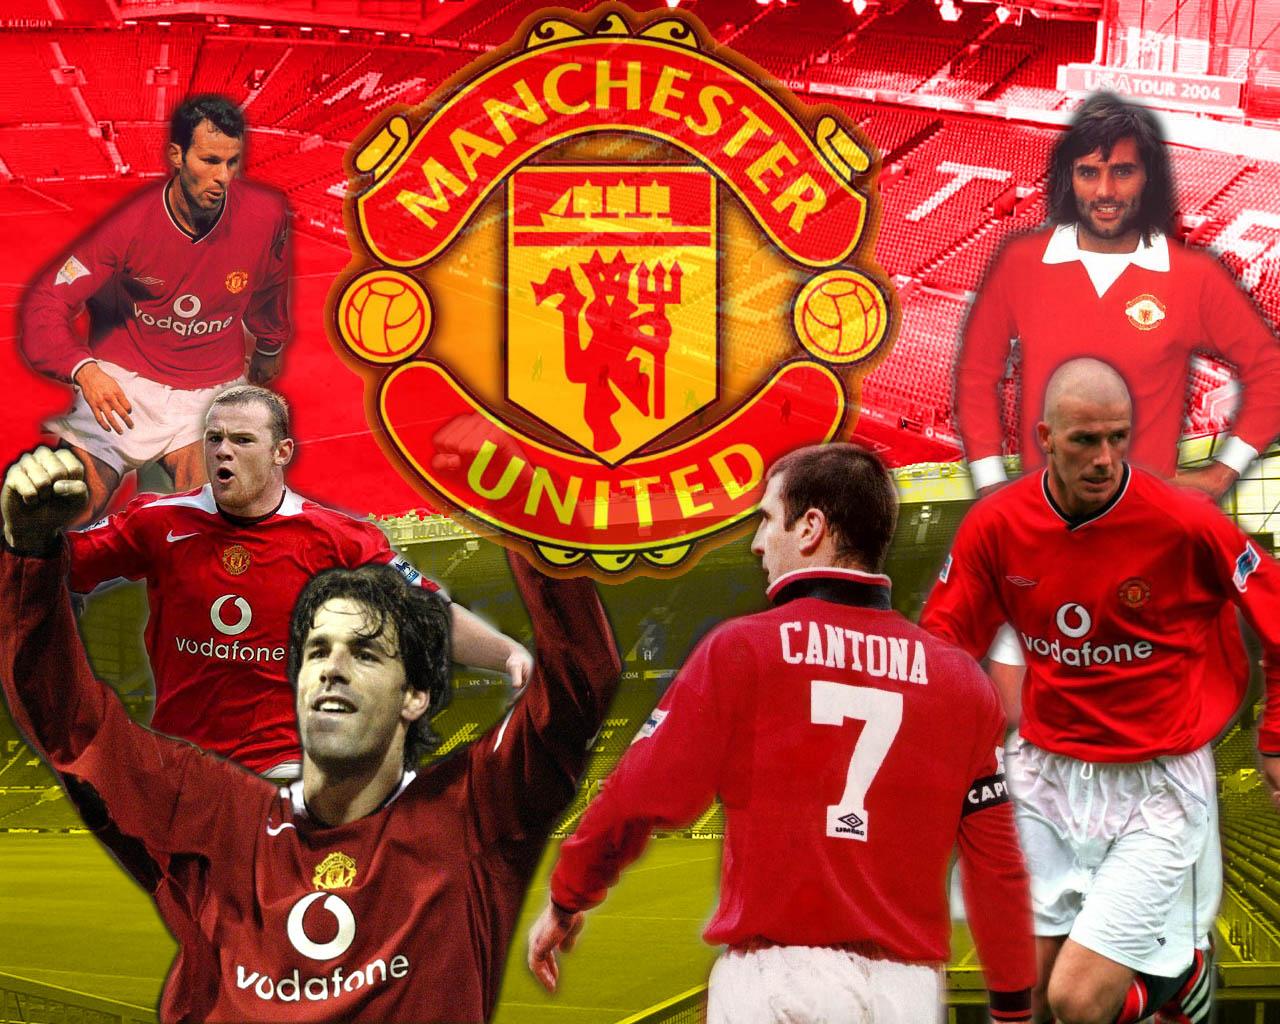 Mancester United Logosunu Pictures Free